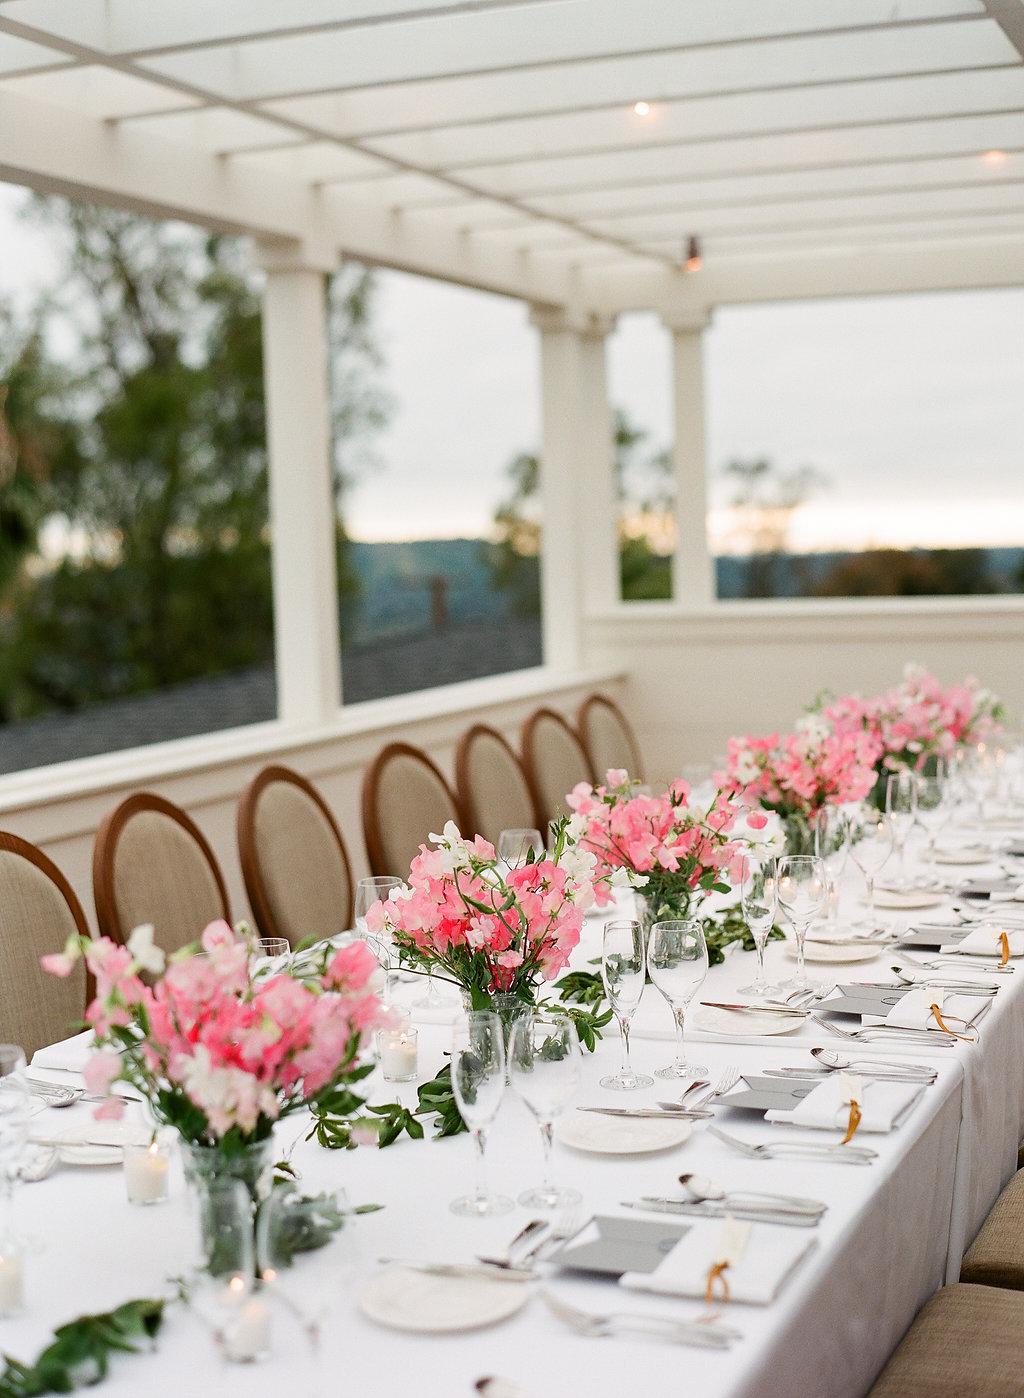 santa-barbara-elopement-wedding-planning-planner-coordinator-day-of-week-small-wedding-el-encanto-lily-pond-pink-kids-garden-riviera-elope-design-estate-candle (18).jpg